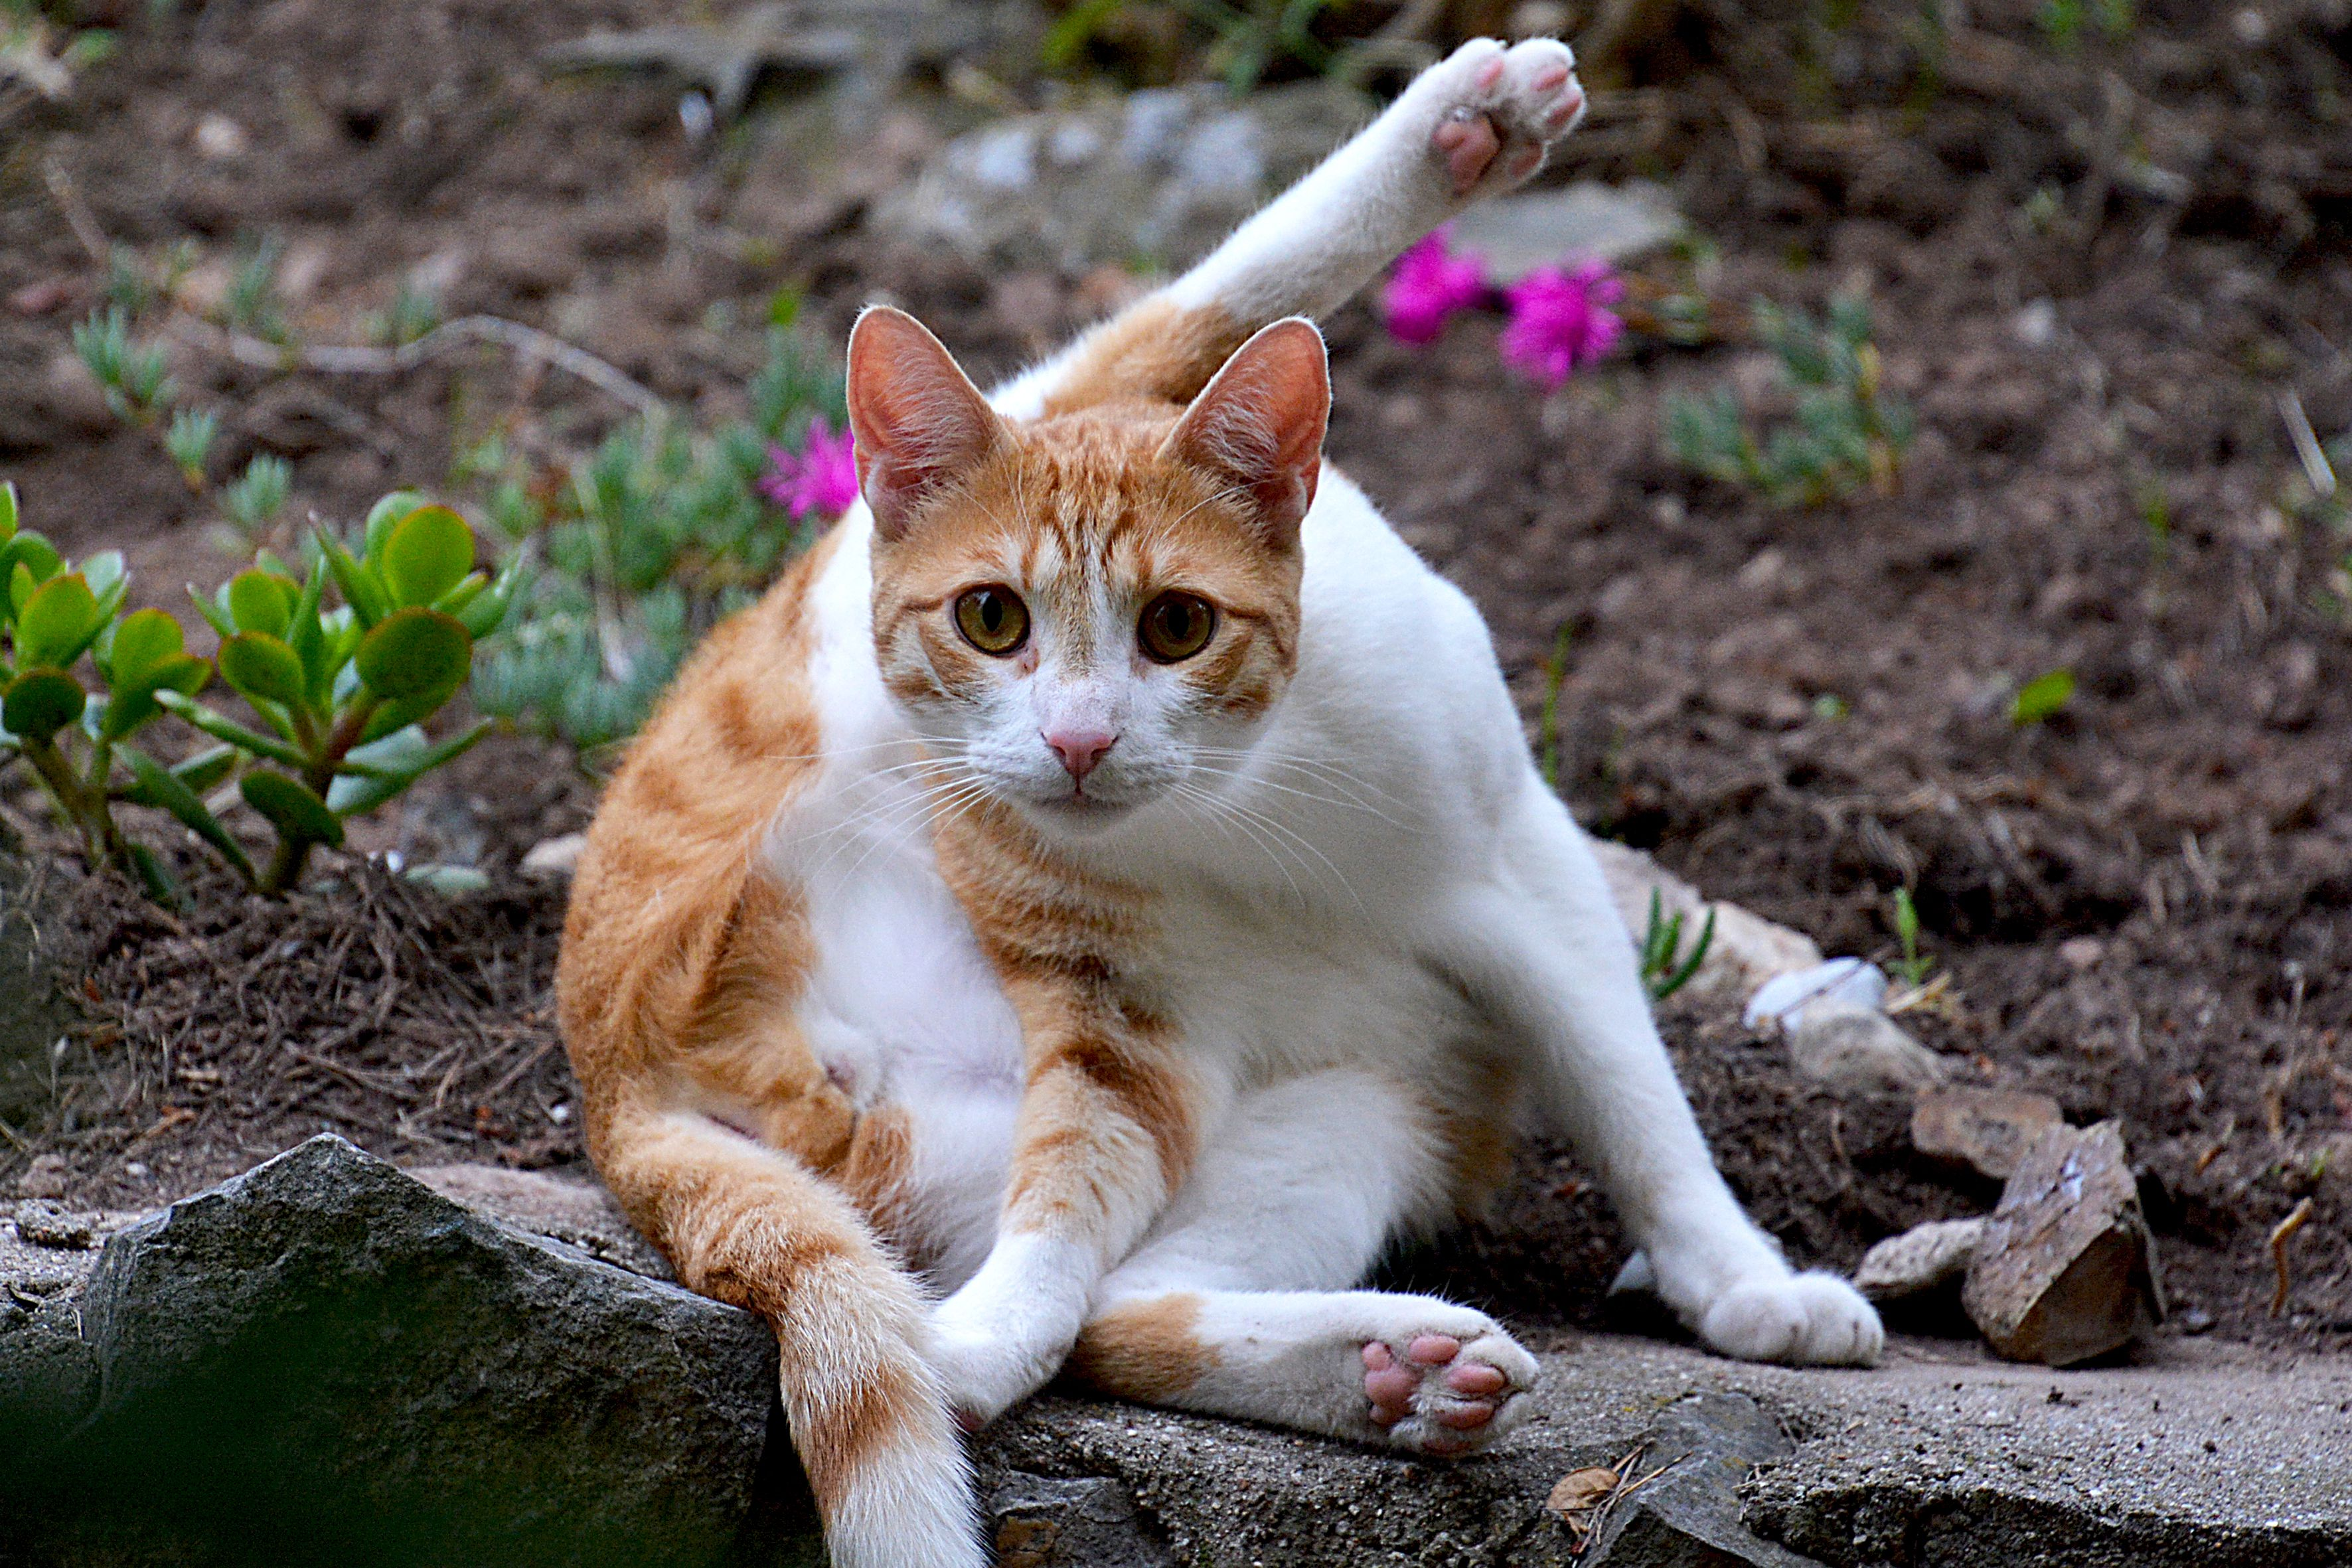 Cat Grooming Understanding Why Cats Groom Themselves